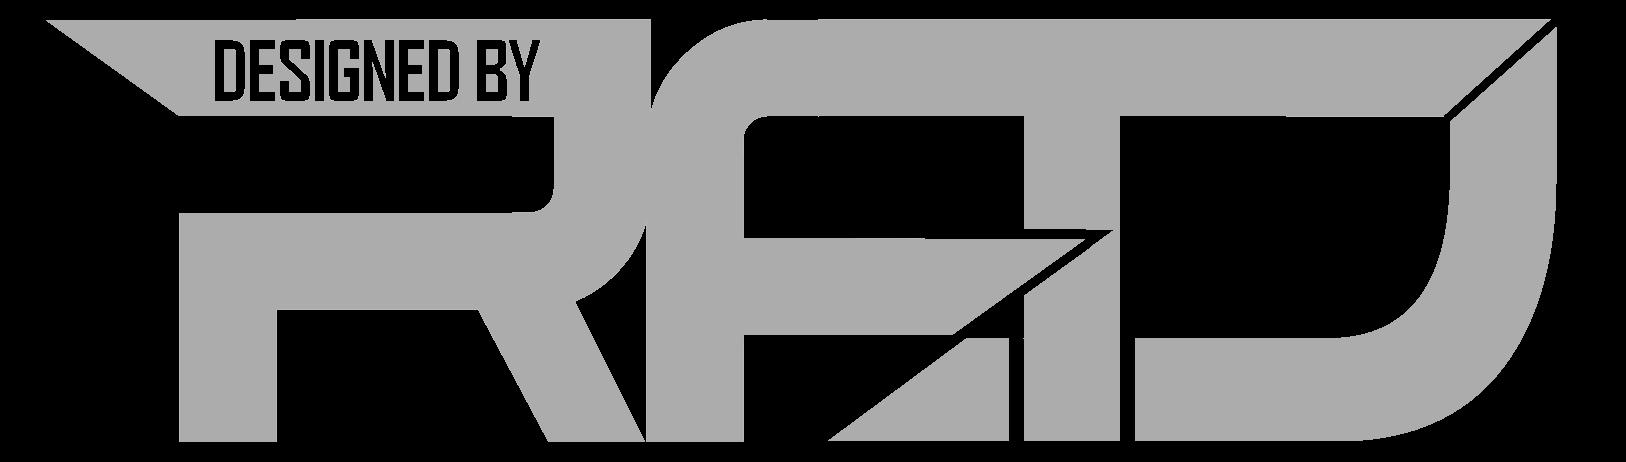 Designed by RAD